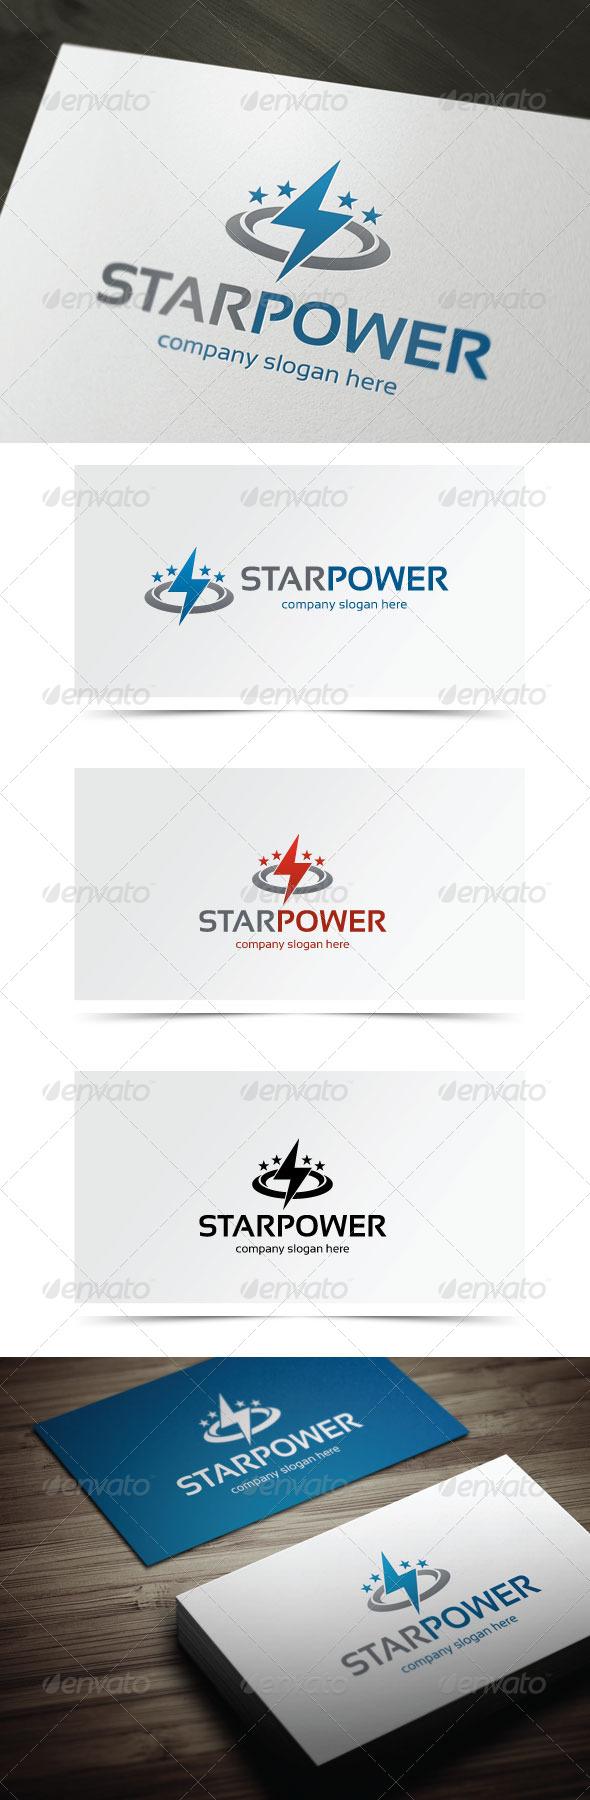 GraphicRiver Star Power 5776913